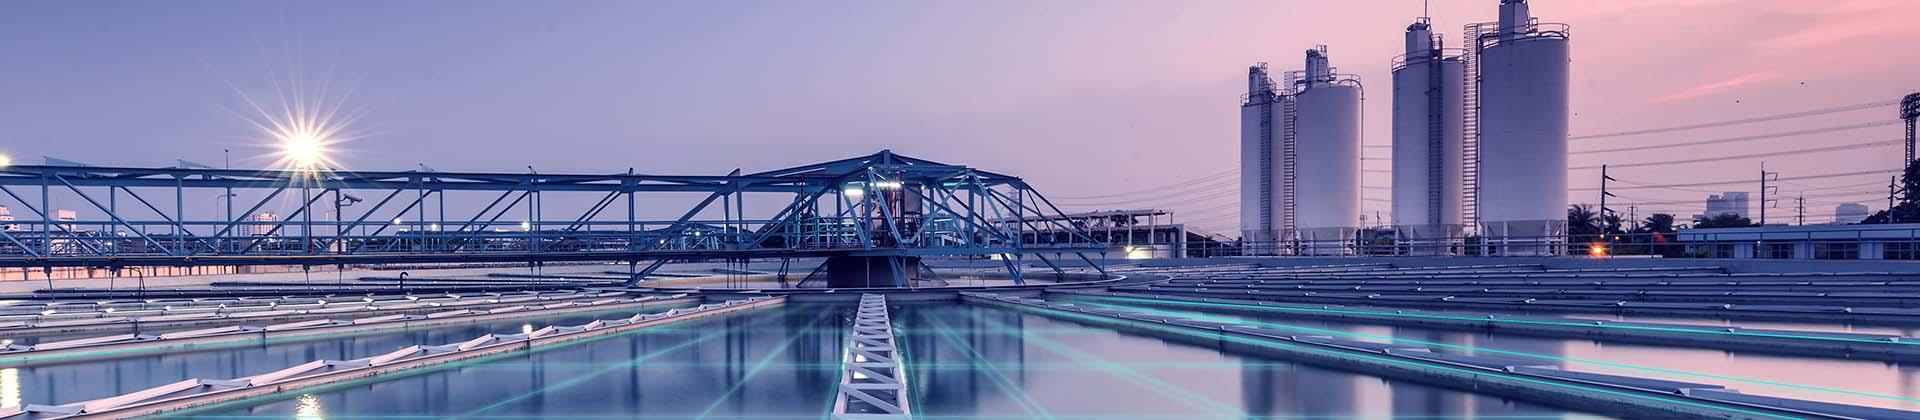 Predictive control to improve wastewater treatment processes